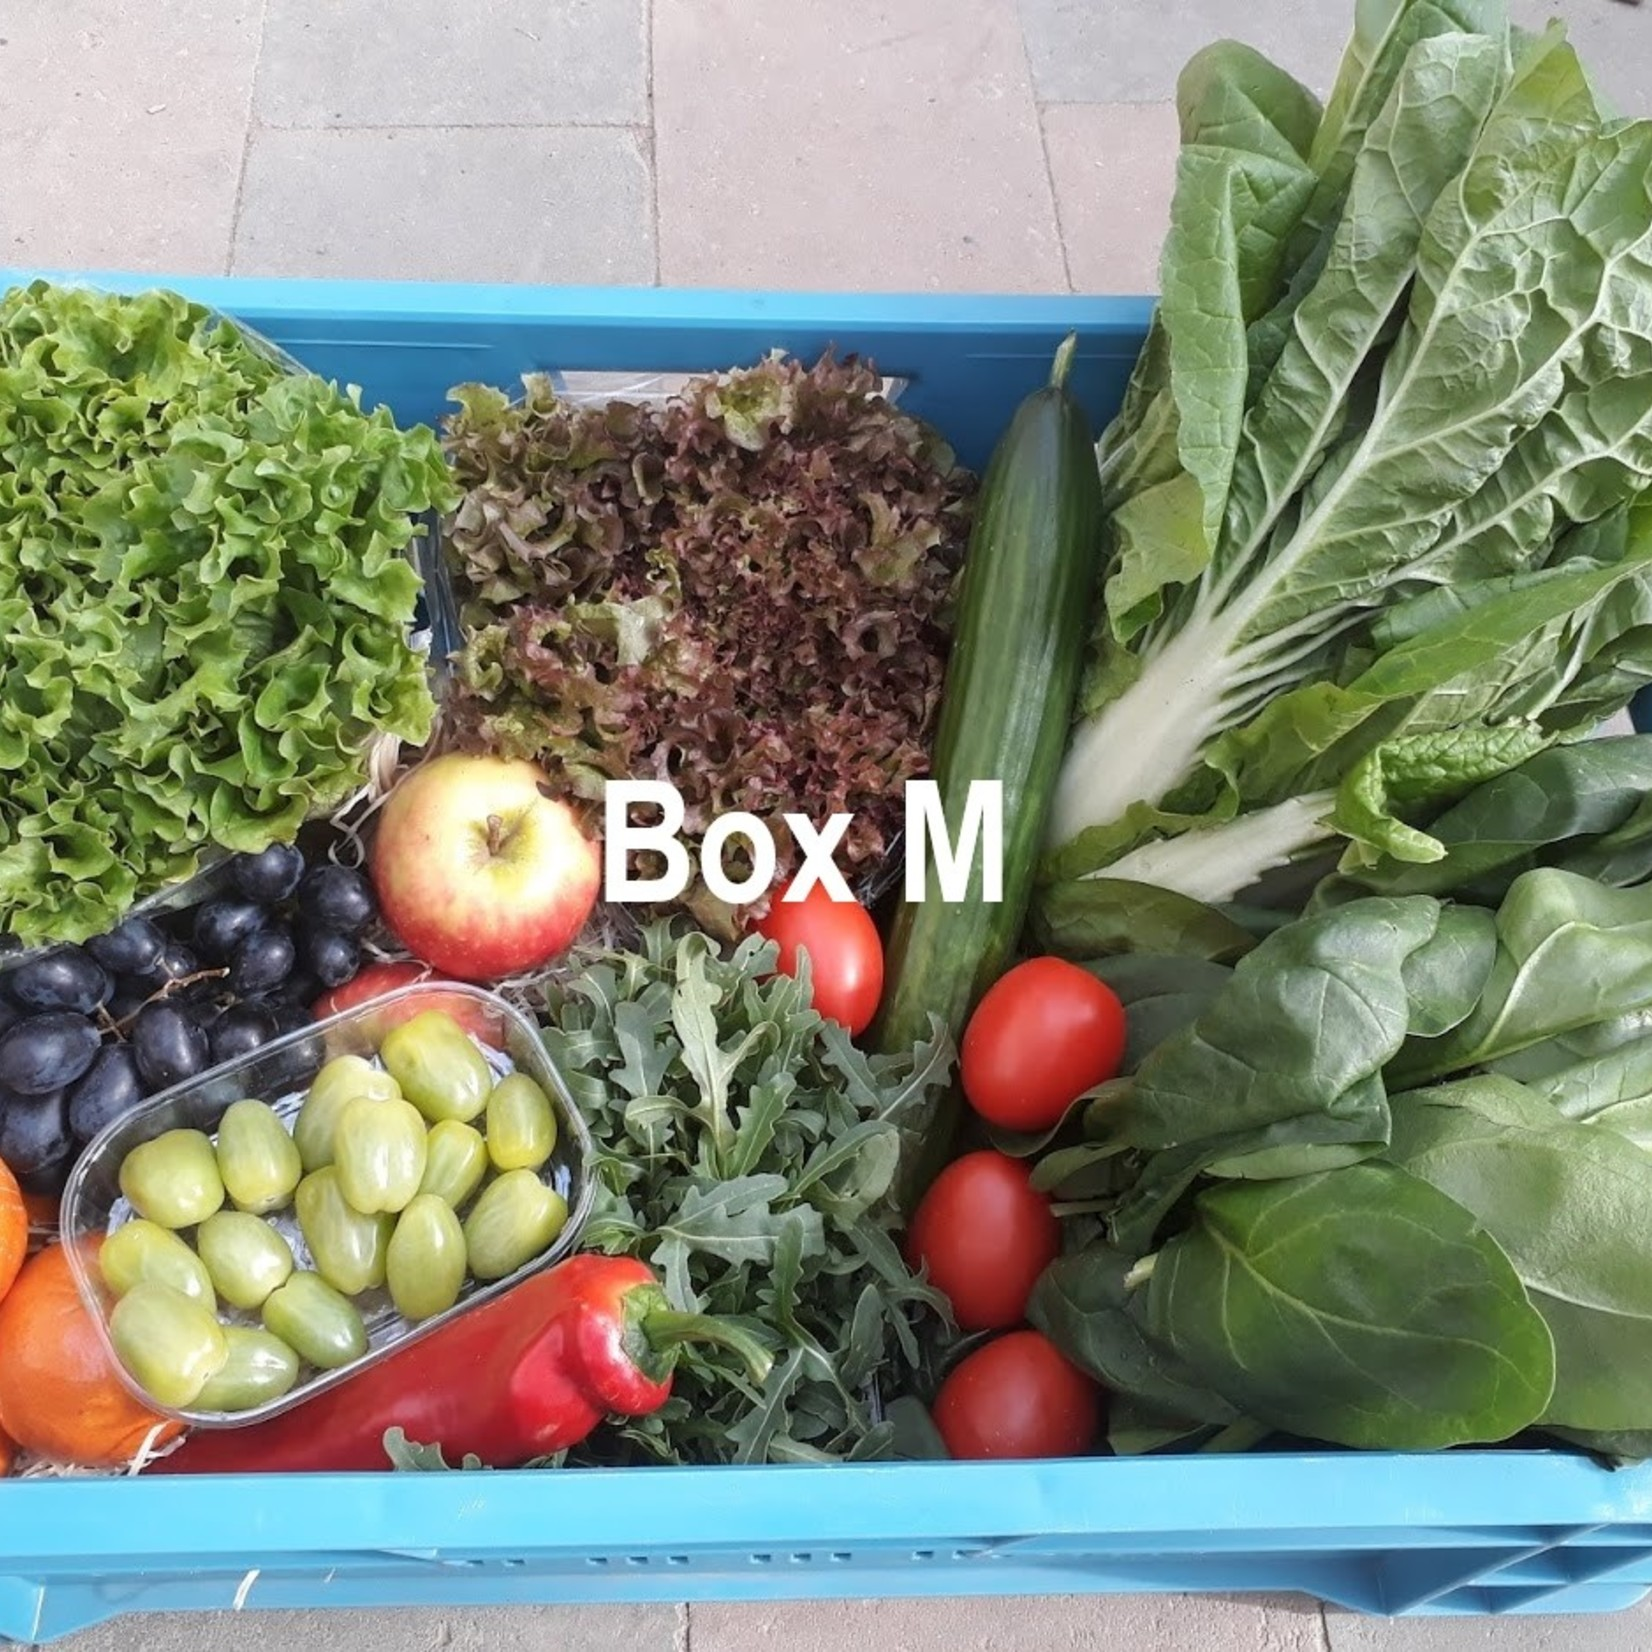 Groente/Fruitbox | Medium (De Groene Schuur)